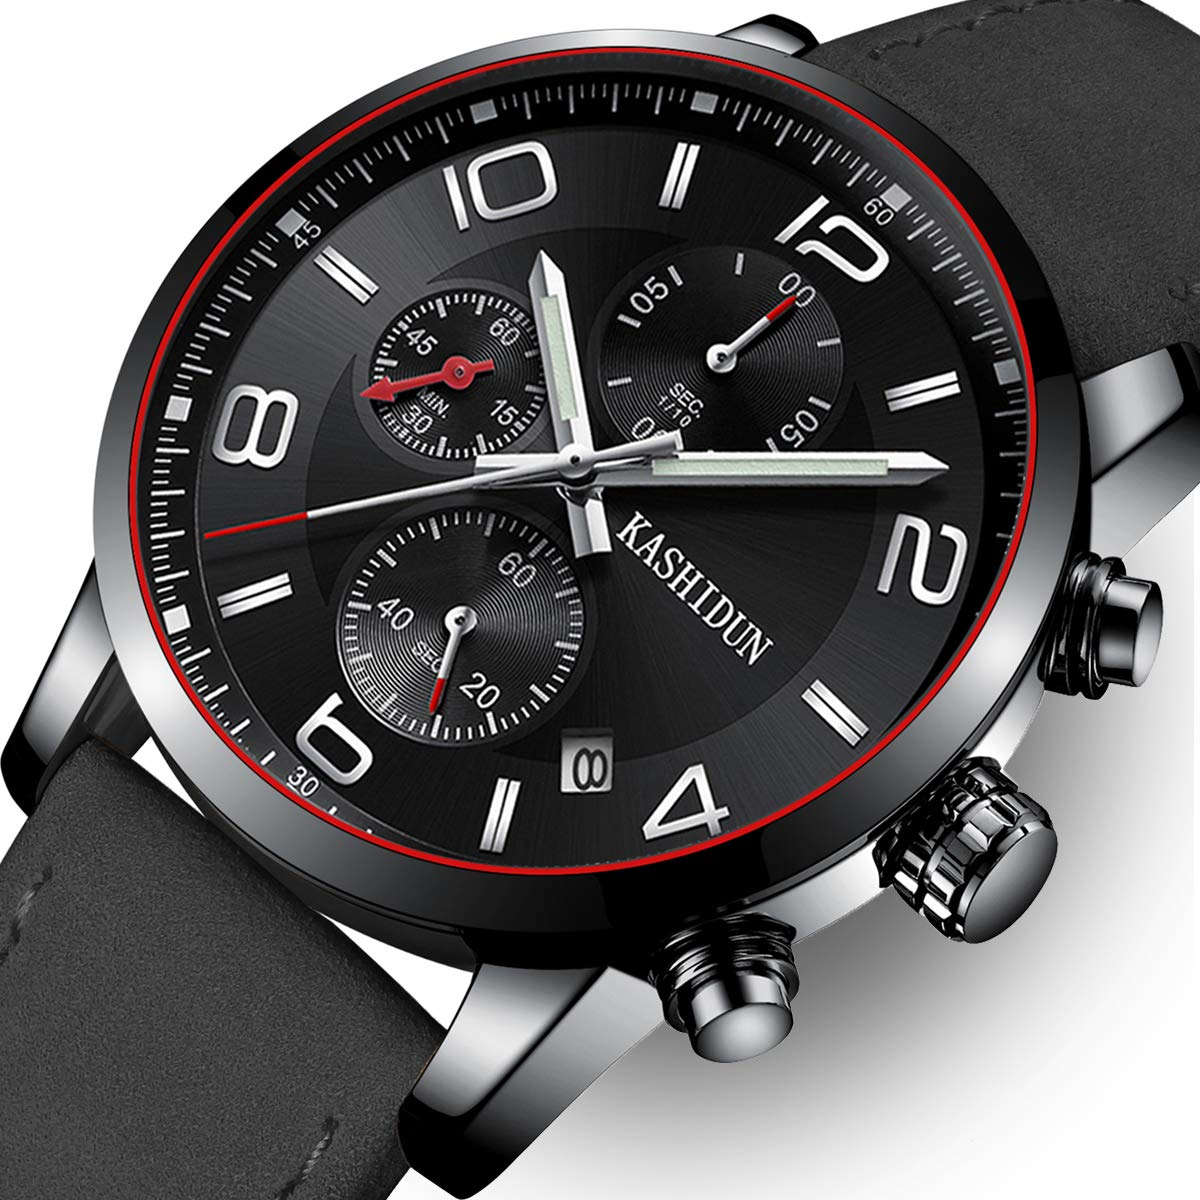 Men Leather Strap Watches Men's Chronograph Waterproof Sport Date Quartz Wrist Watch (Black A) by KASHIDUN